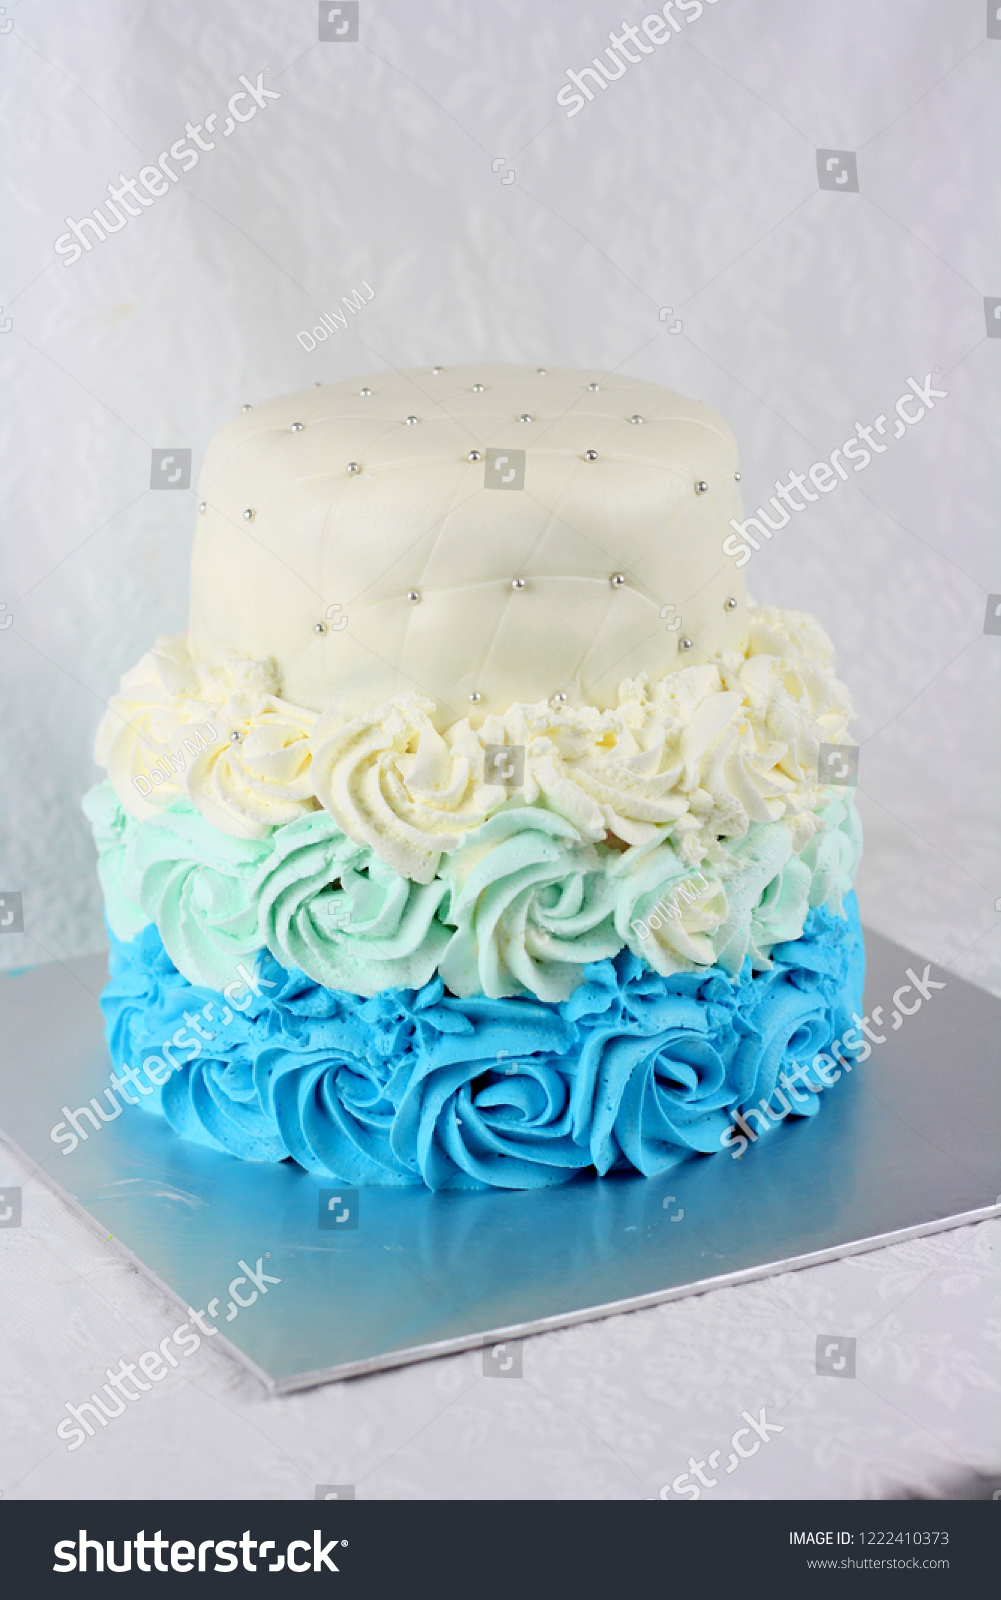 Blue Rose Swirl Buttercream Cake Ombre Stock Photo Edit Now 1222410373